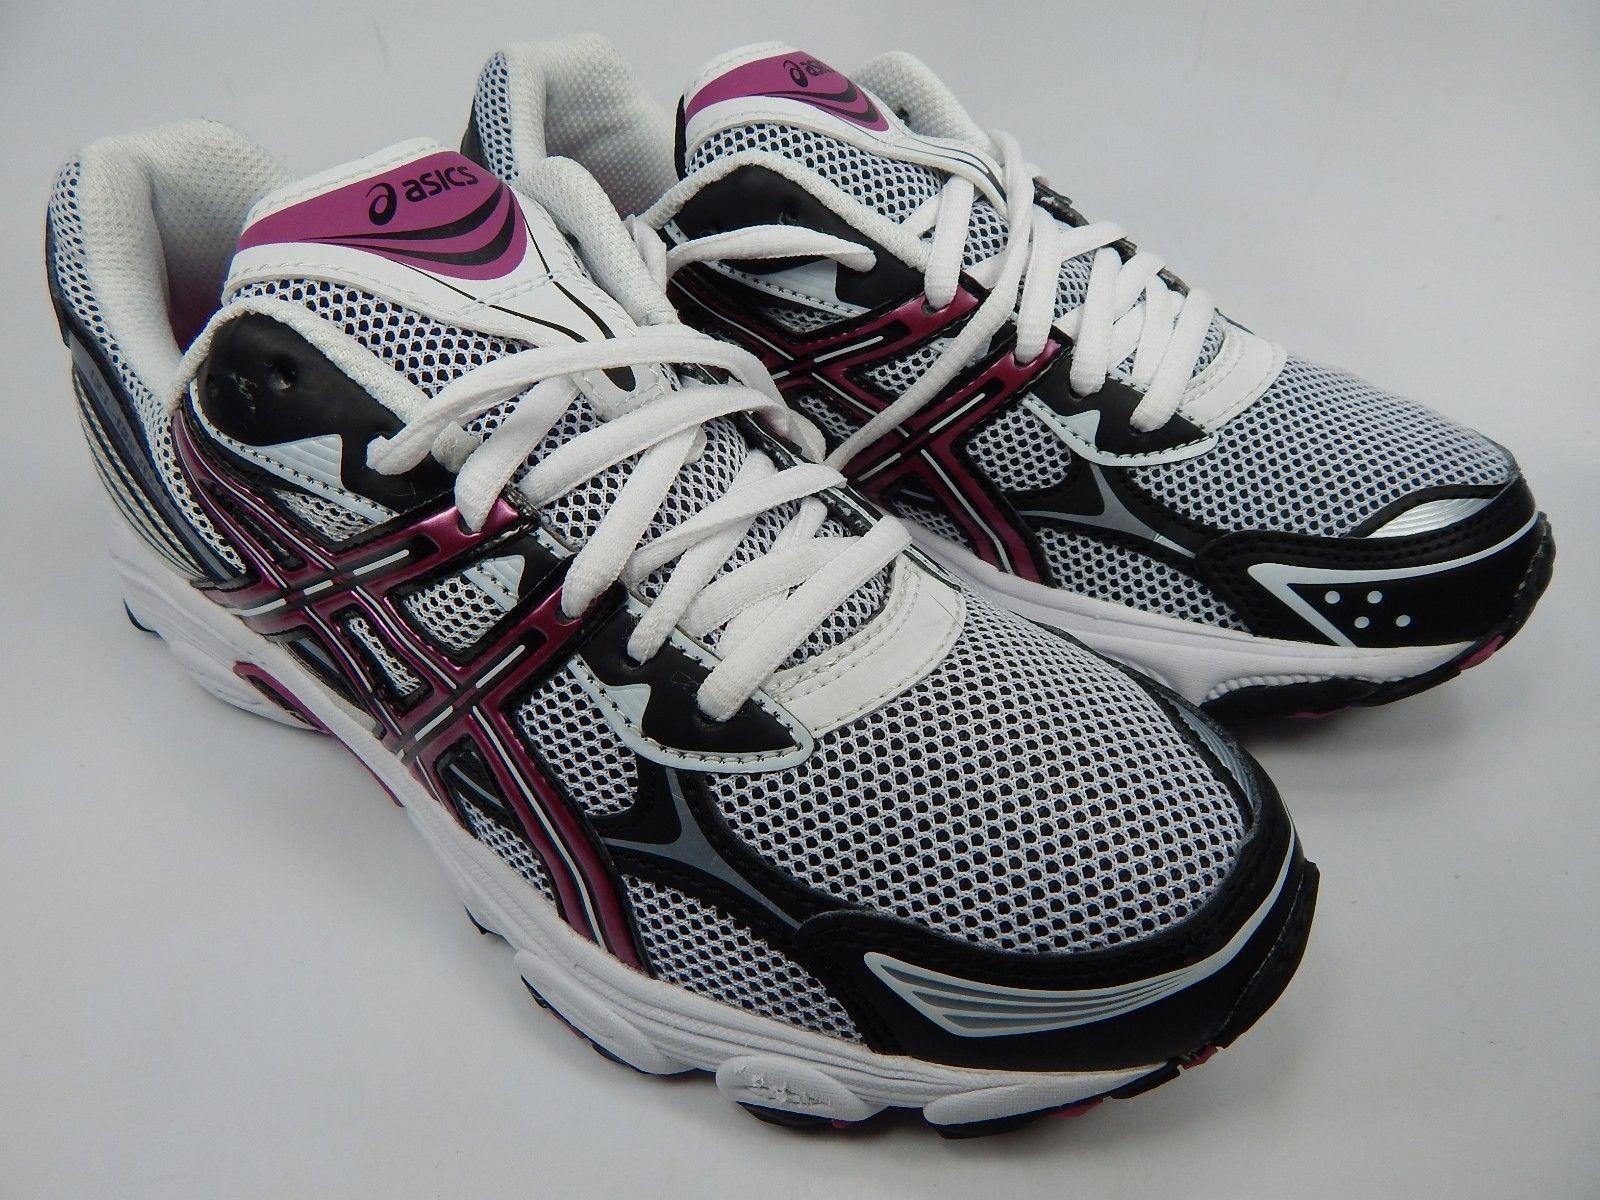 31c238f5fd7b Asics Gel Galaxy 5 Running Shoes Women s Size US 8 M (B) EU 39.5